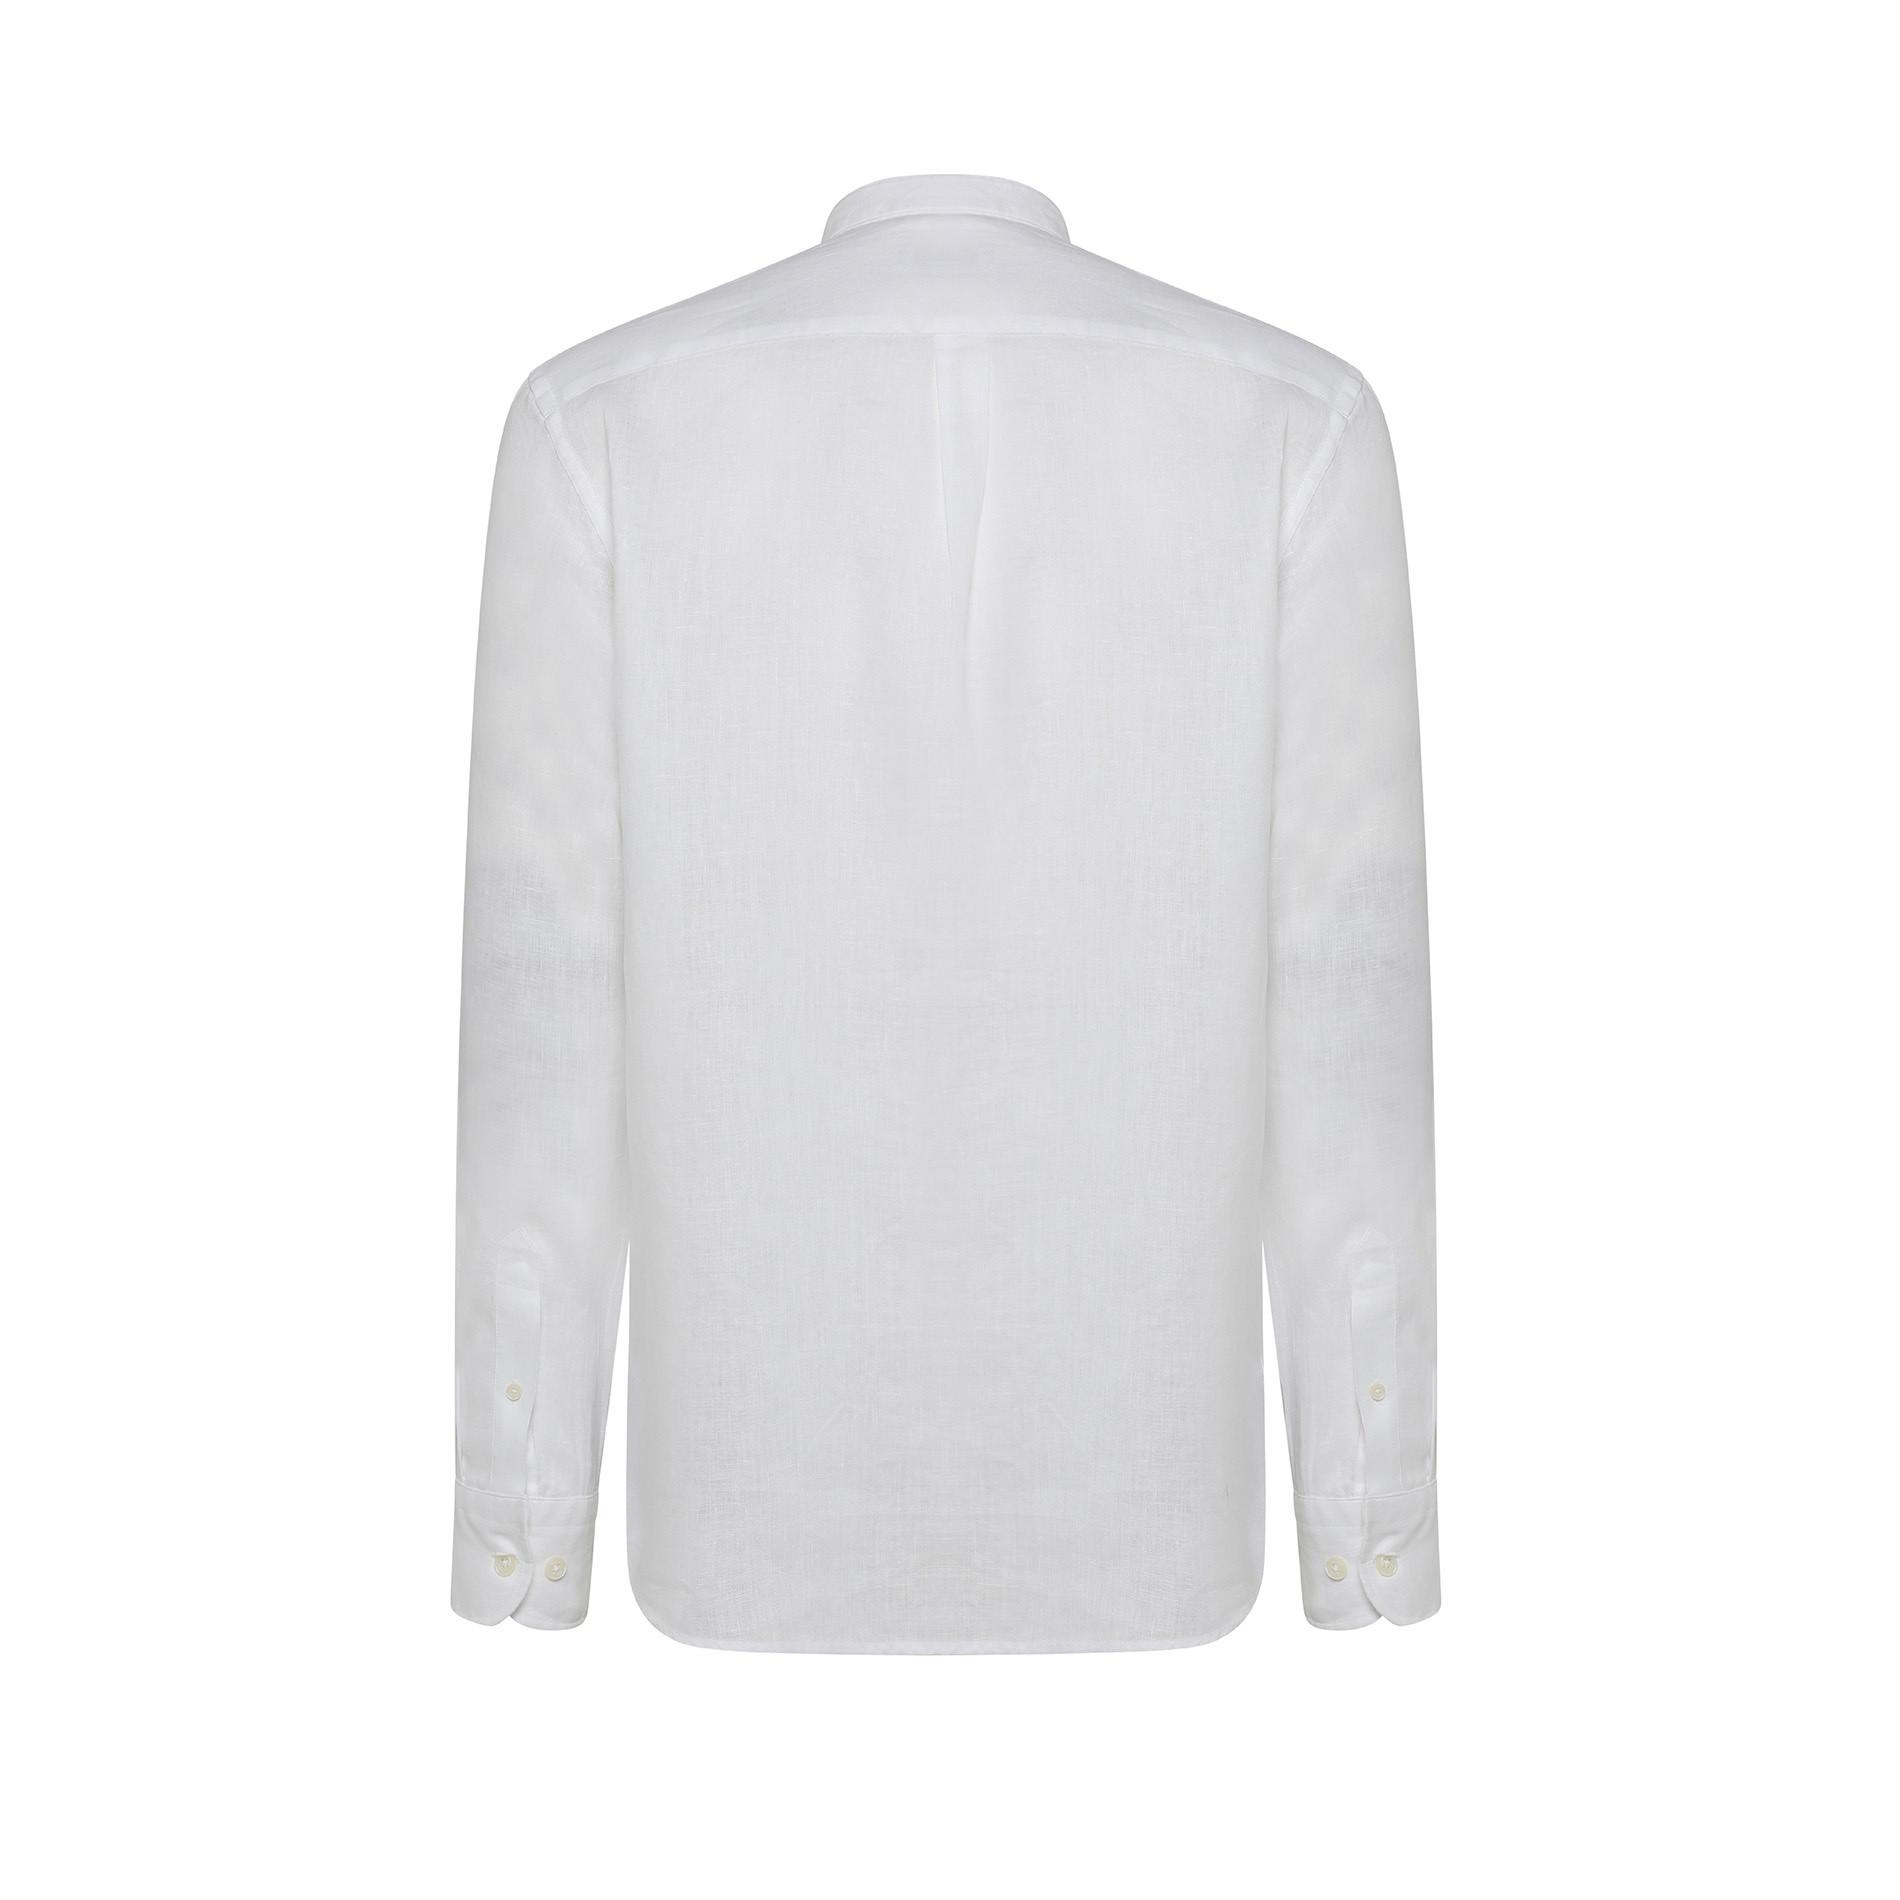 Camicia puro lino tailor fit Luca D'Altieri, Bianco, large image number 1